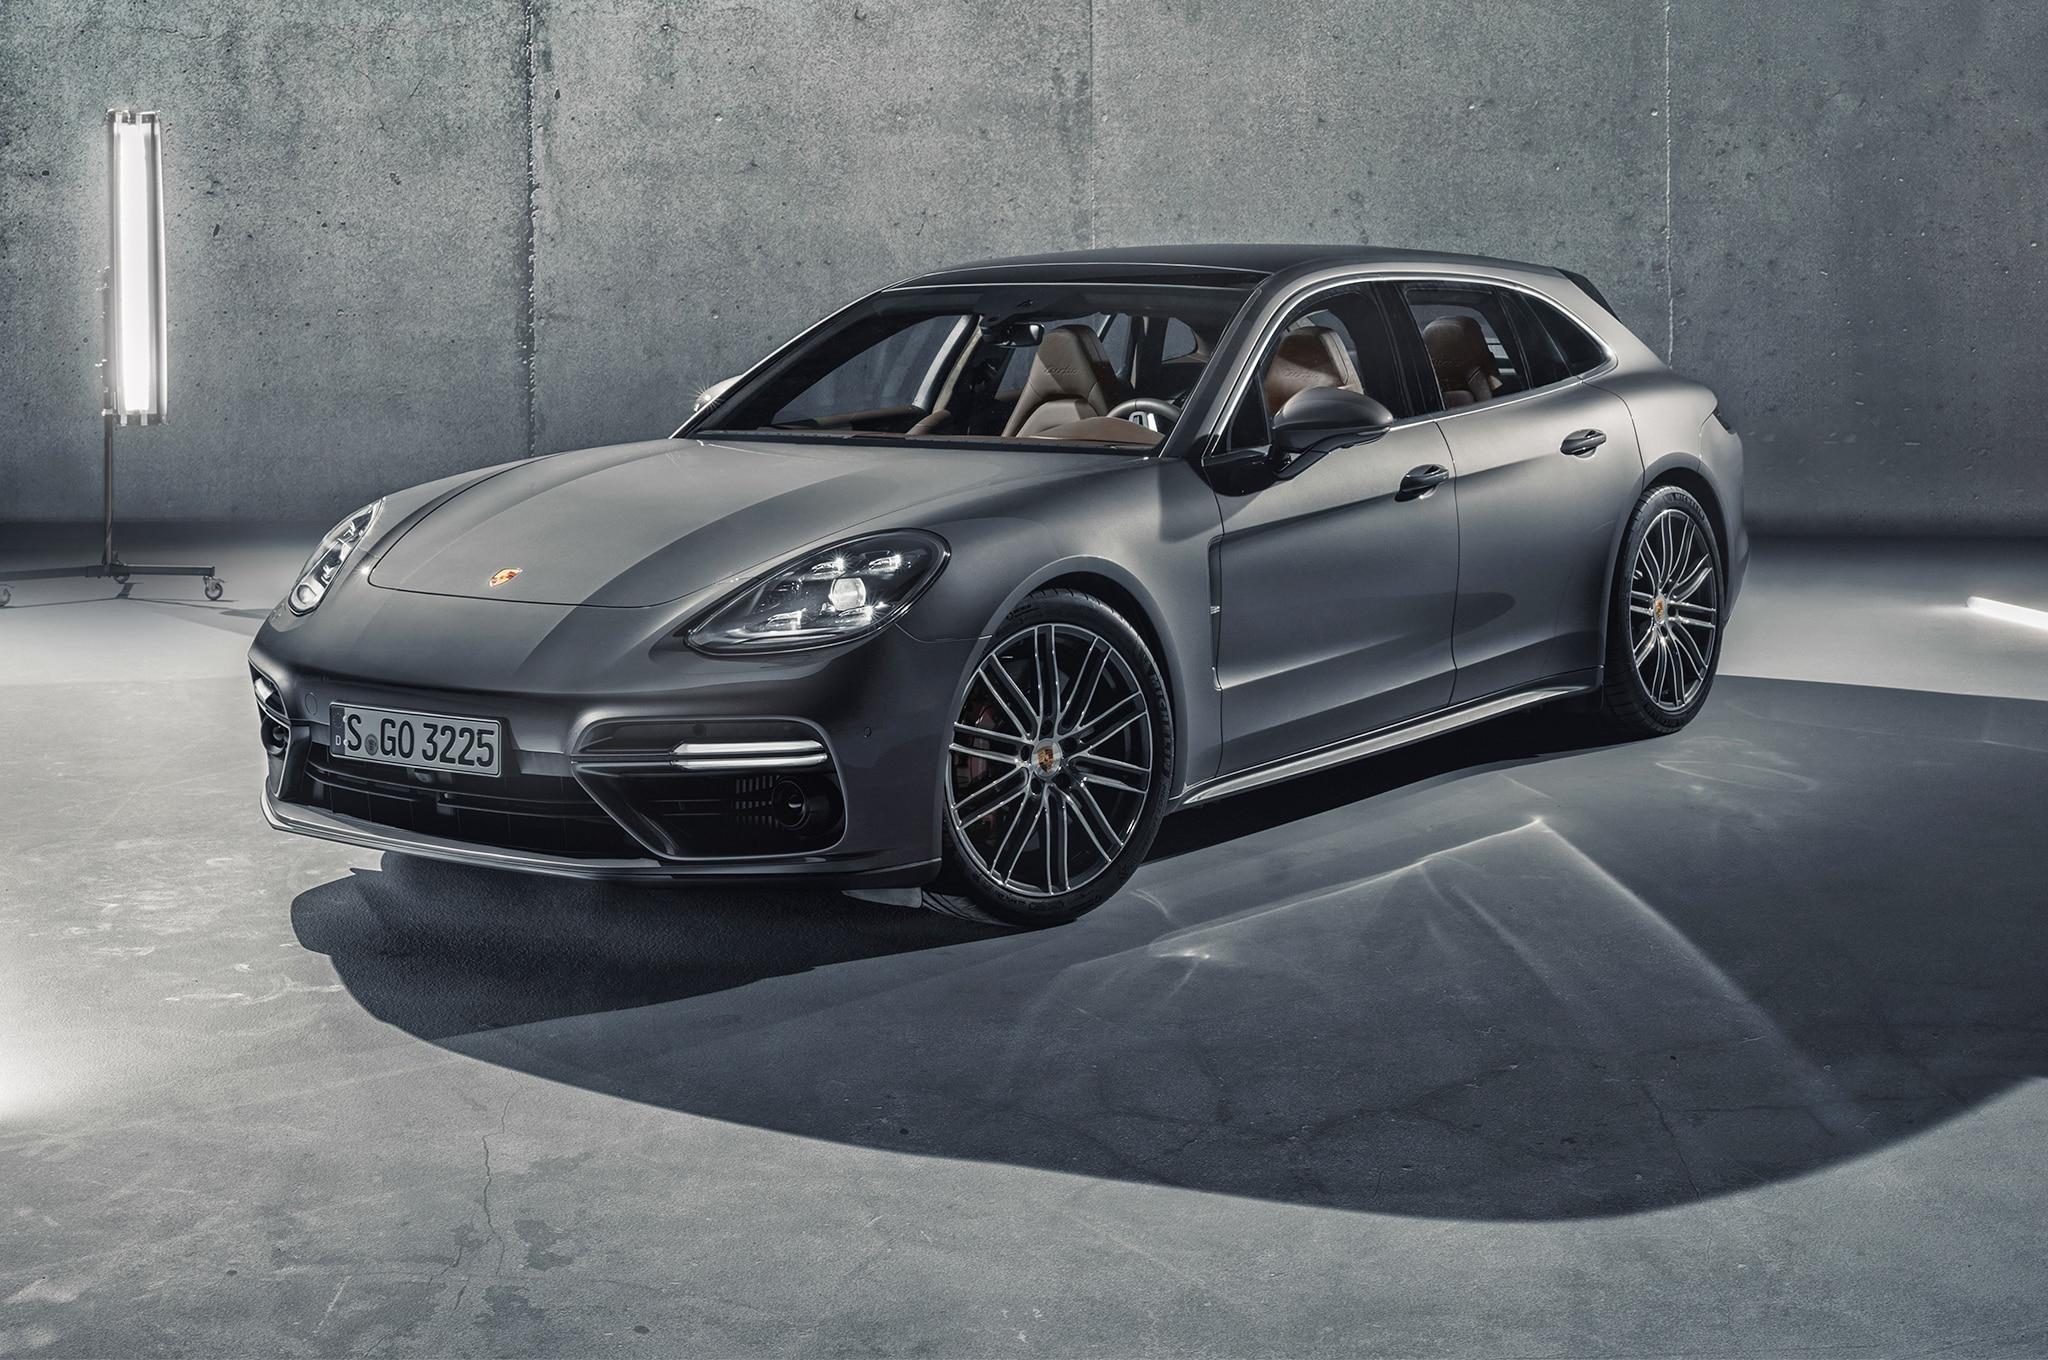 2018 Porsche Panamera Sport Turismo Front Three Quarter